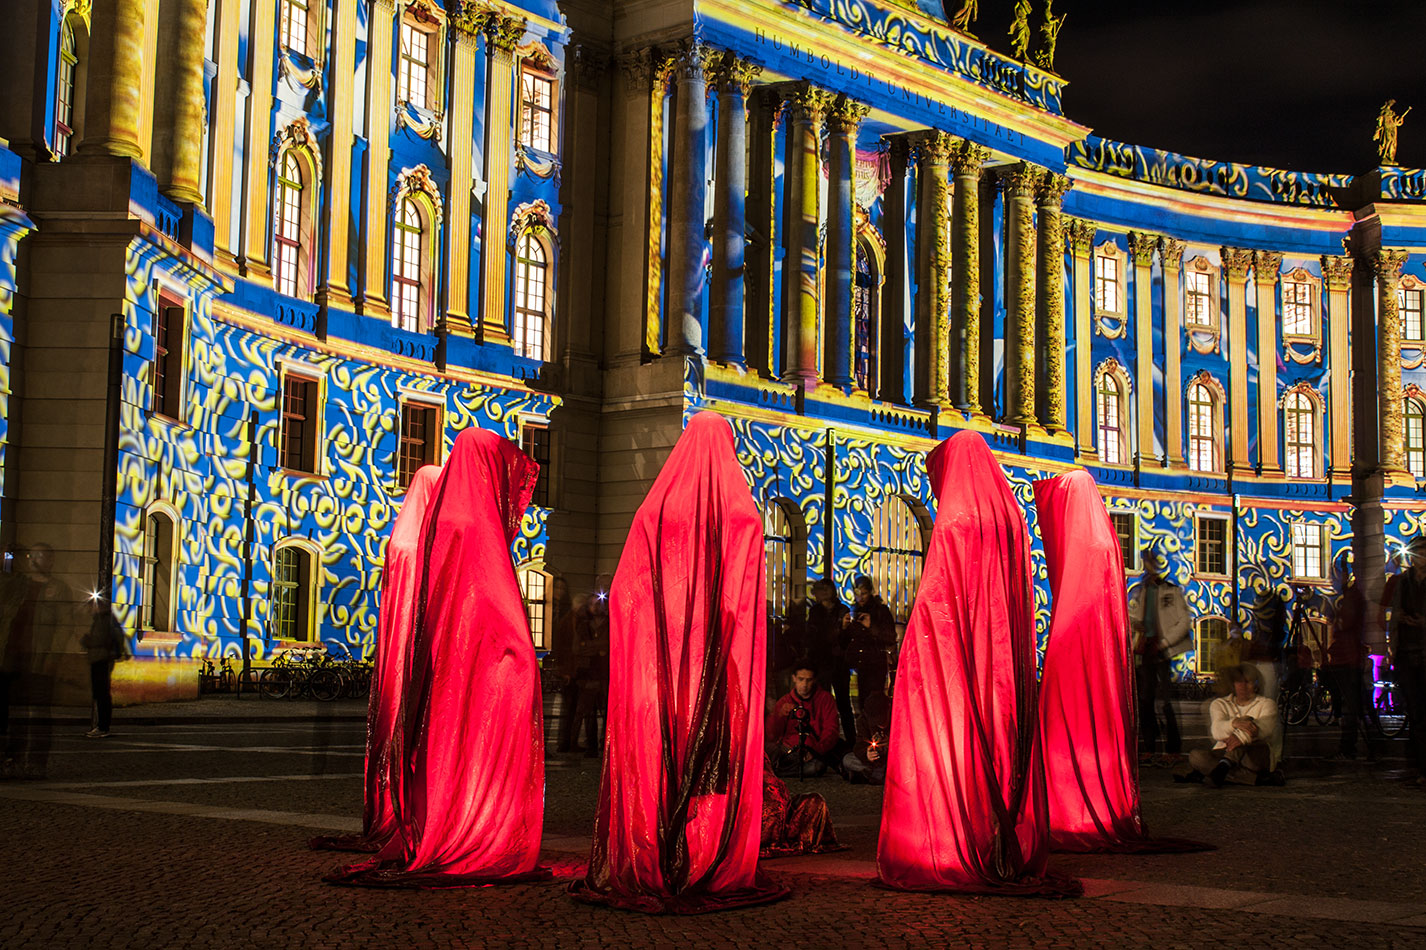 festival-of-lights-berlin-humboldt-university-light-art-show-exhibition-lumina-guardians-of-time-manfred-kili-kielnhofer-contemporary-arts-design-sculpture-3401